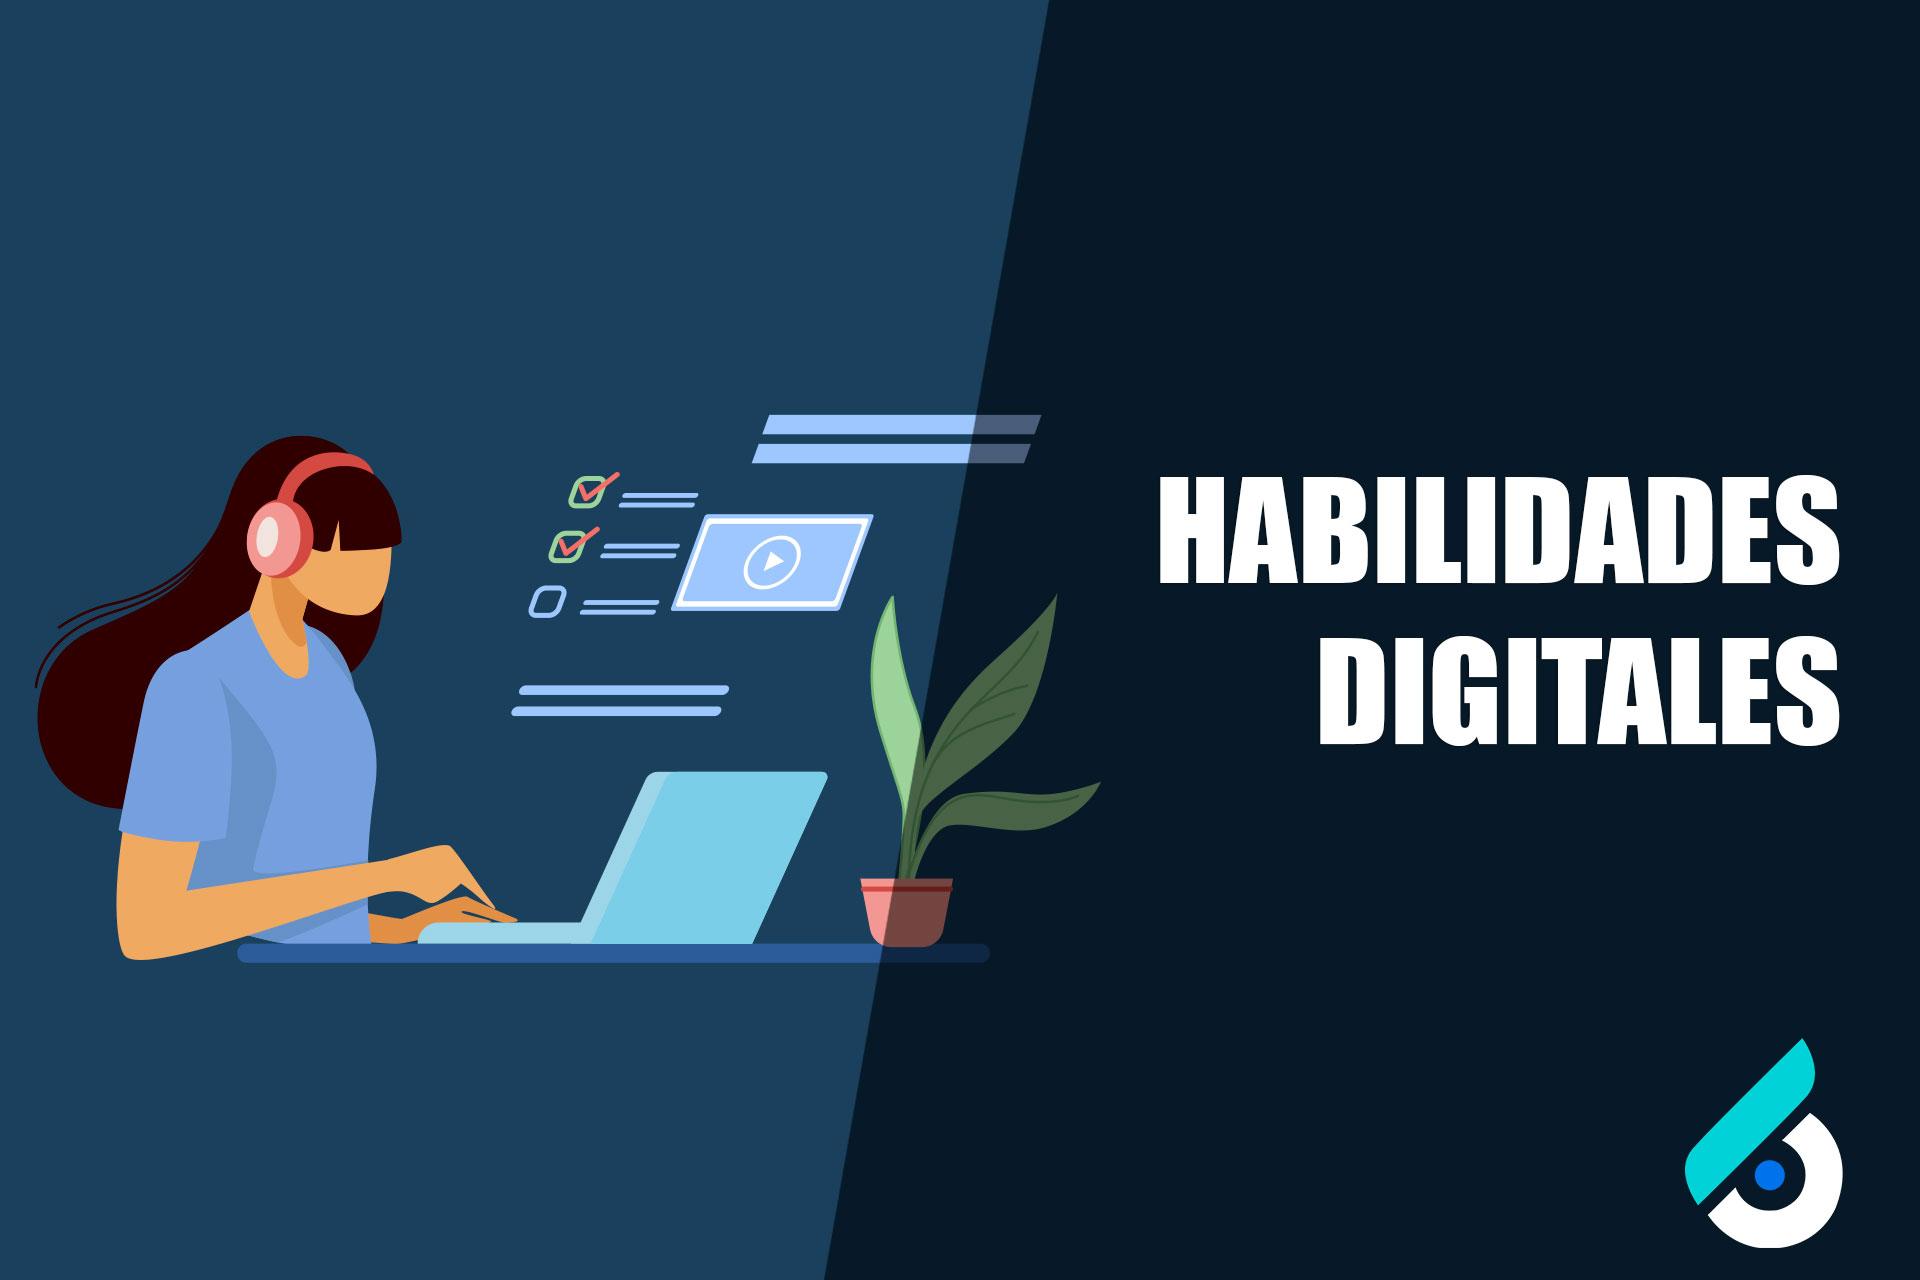 AD2020-HD-001 | Habilidades Digitales